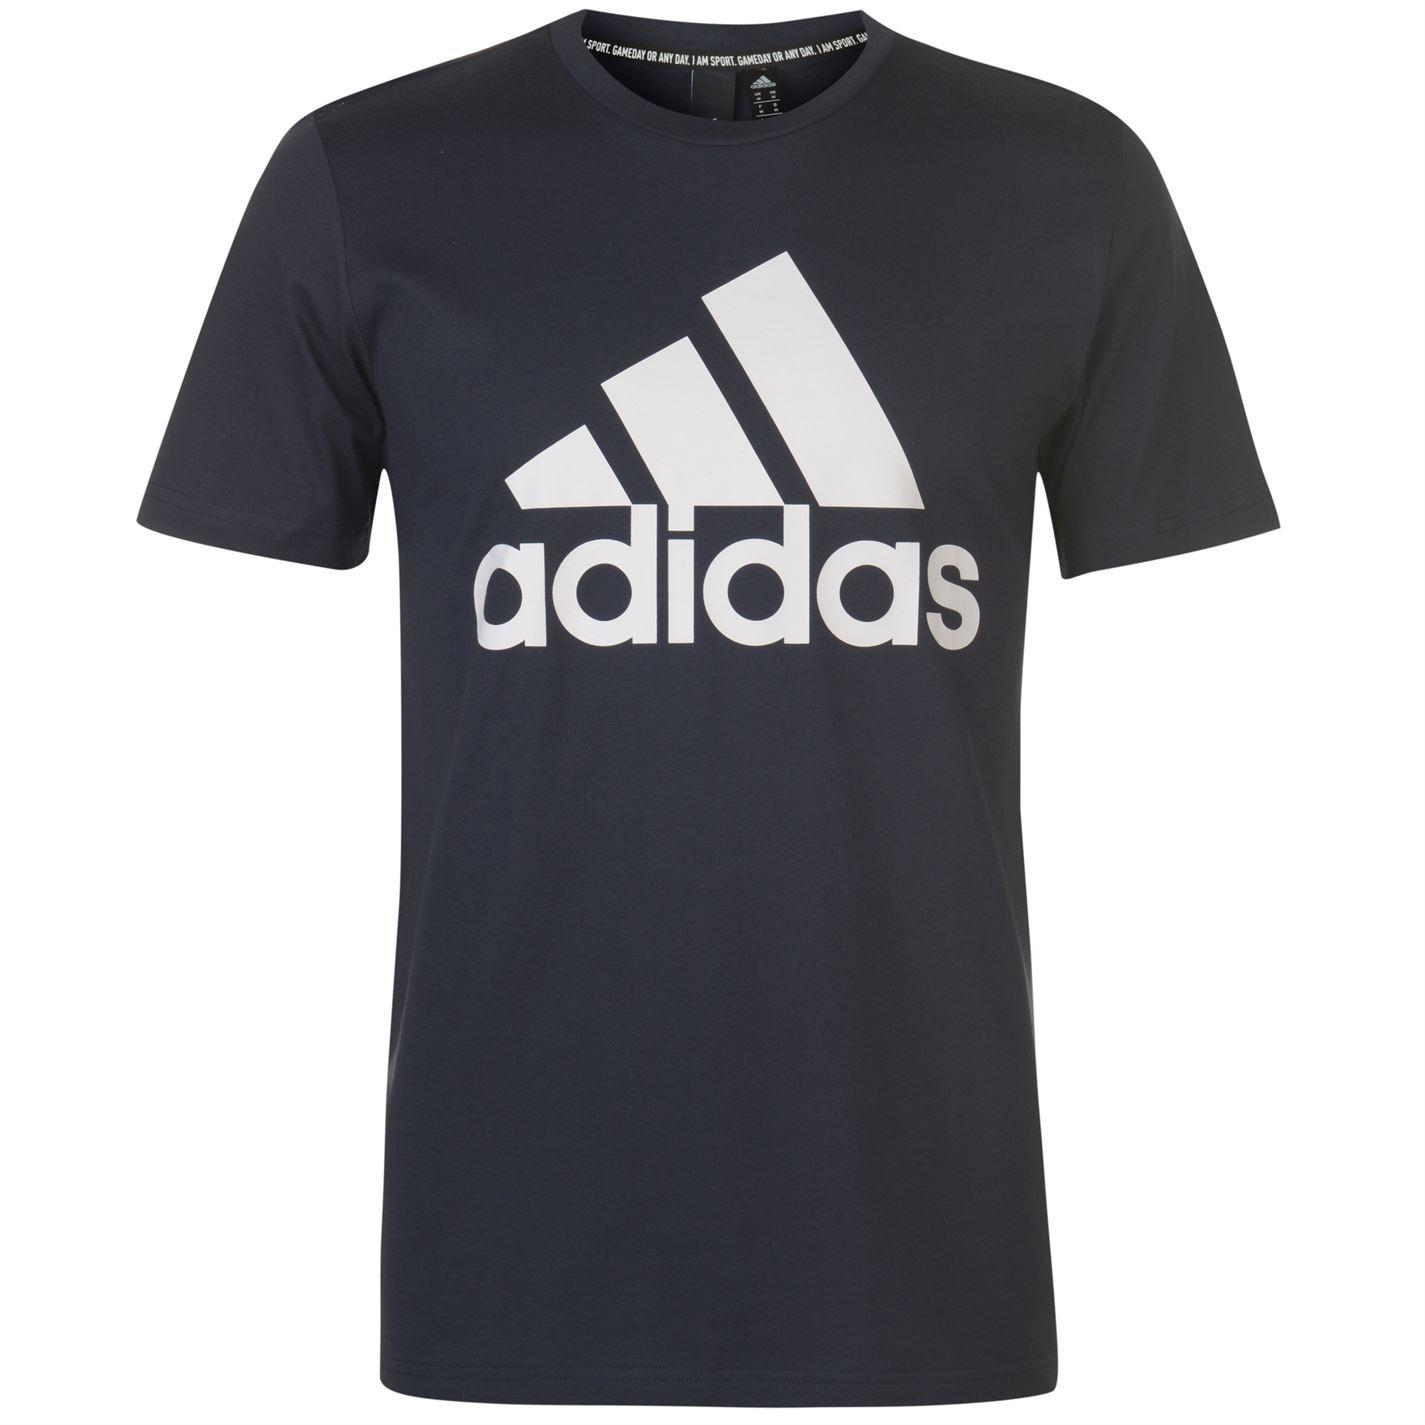 Adidas Badge Of Sport Tee Mens